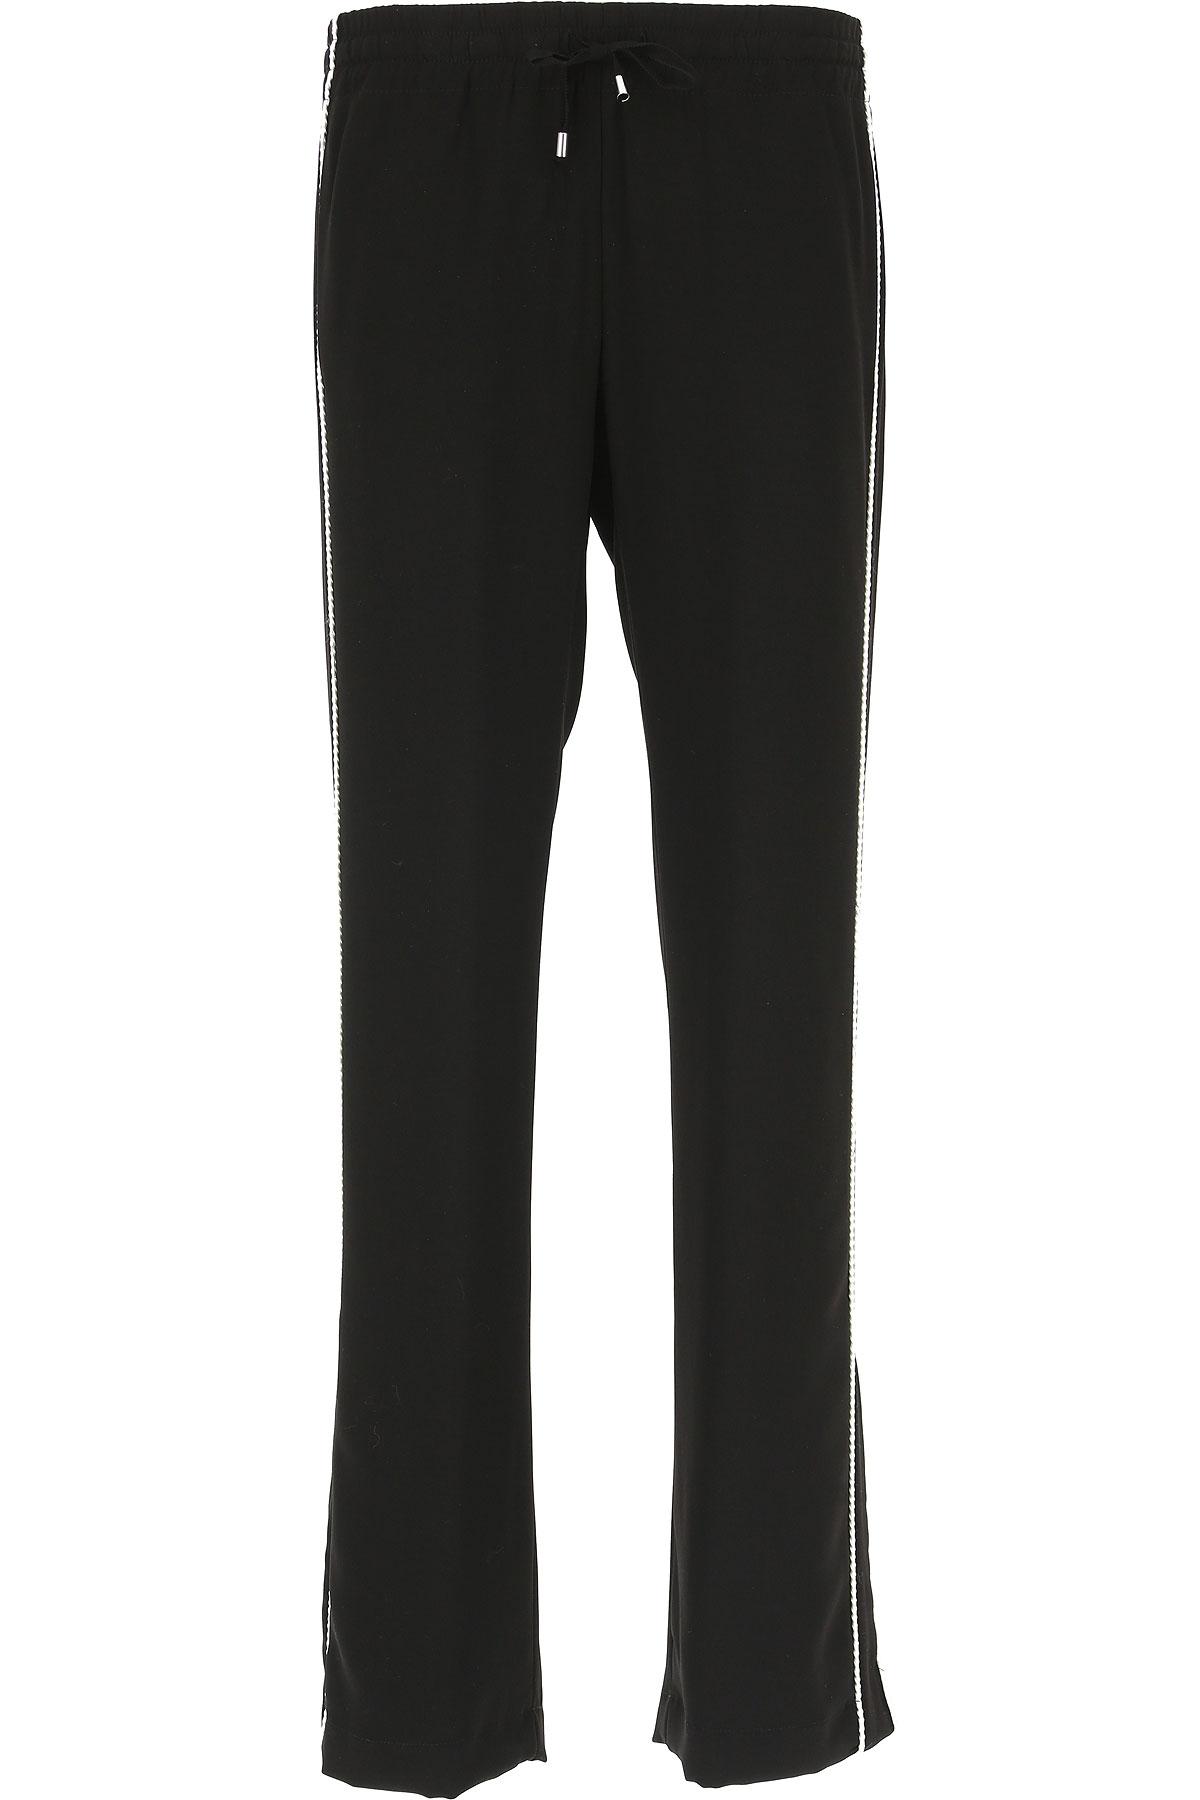 Image of Ermanno Scervino Pants for Women, Black, polyester, 2017, 24 26 28